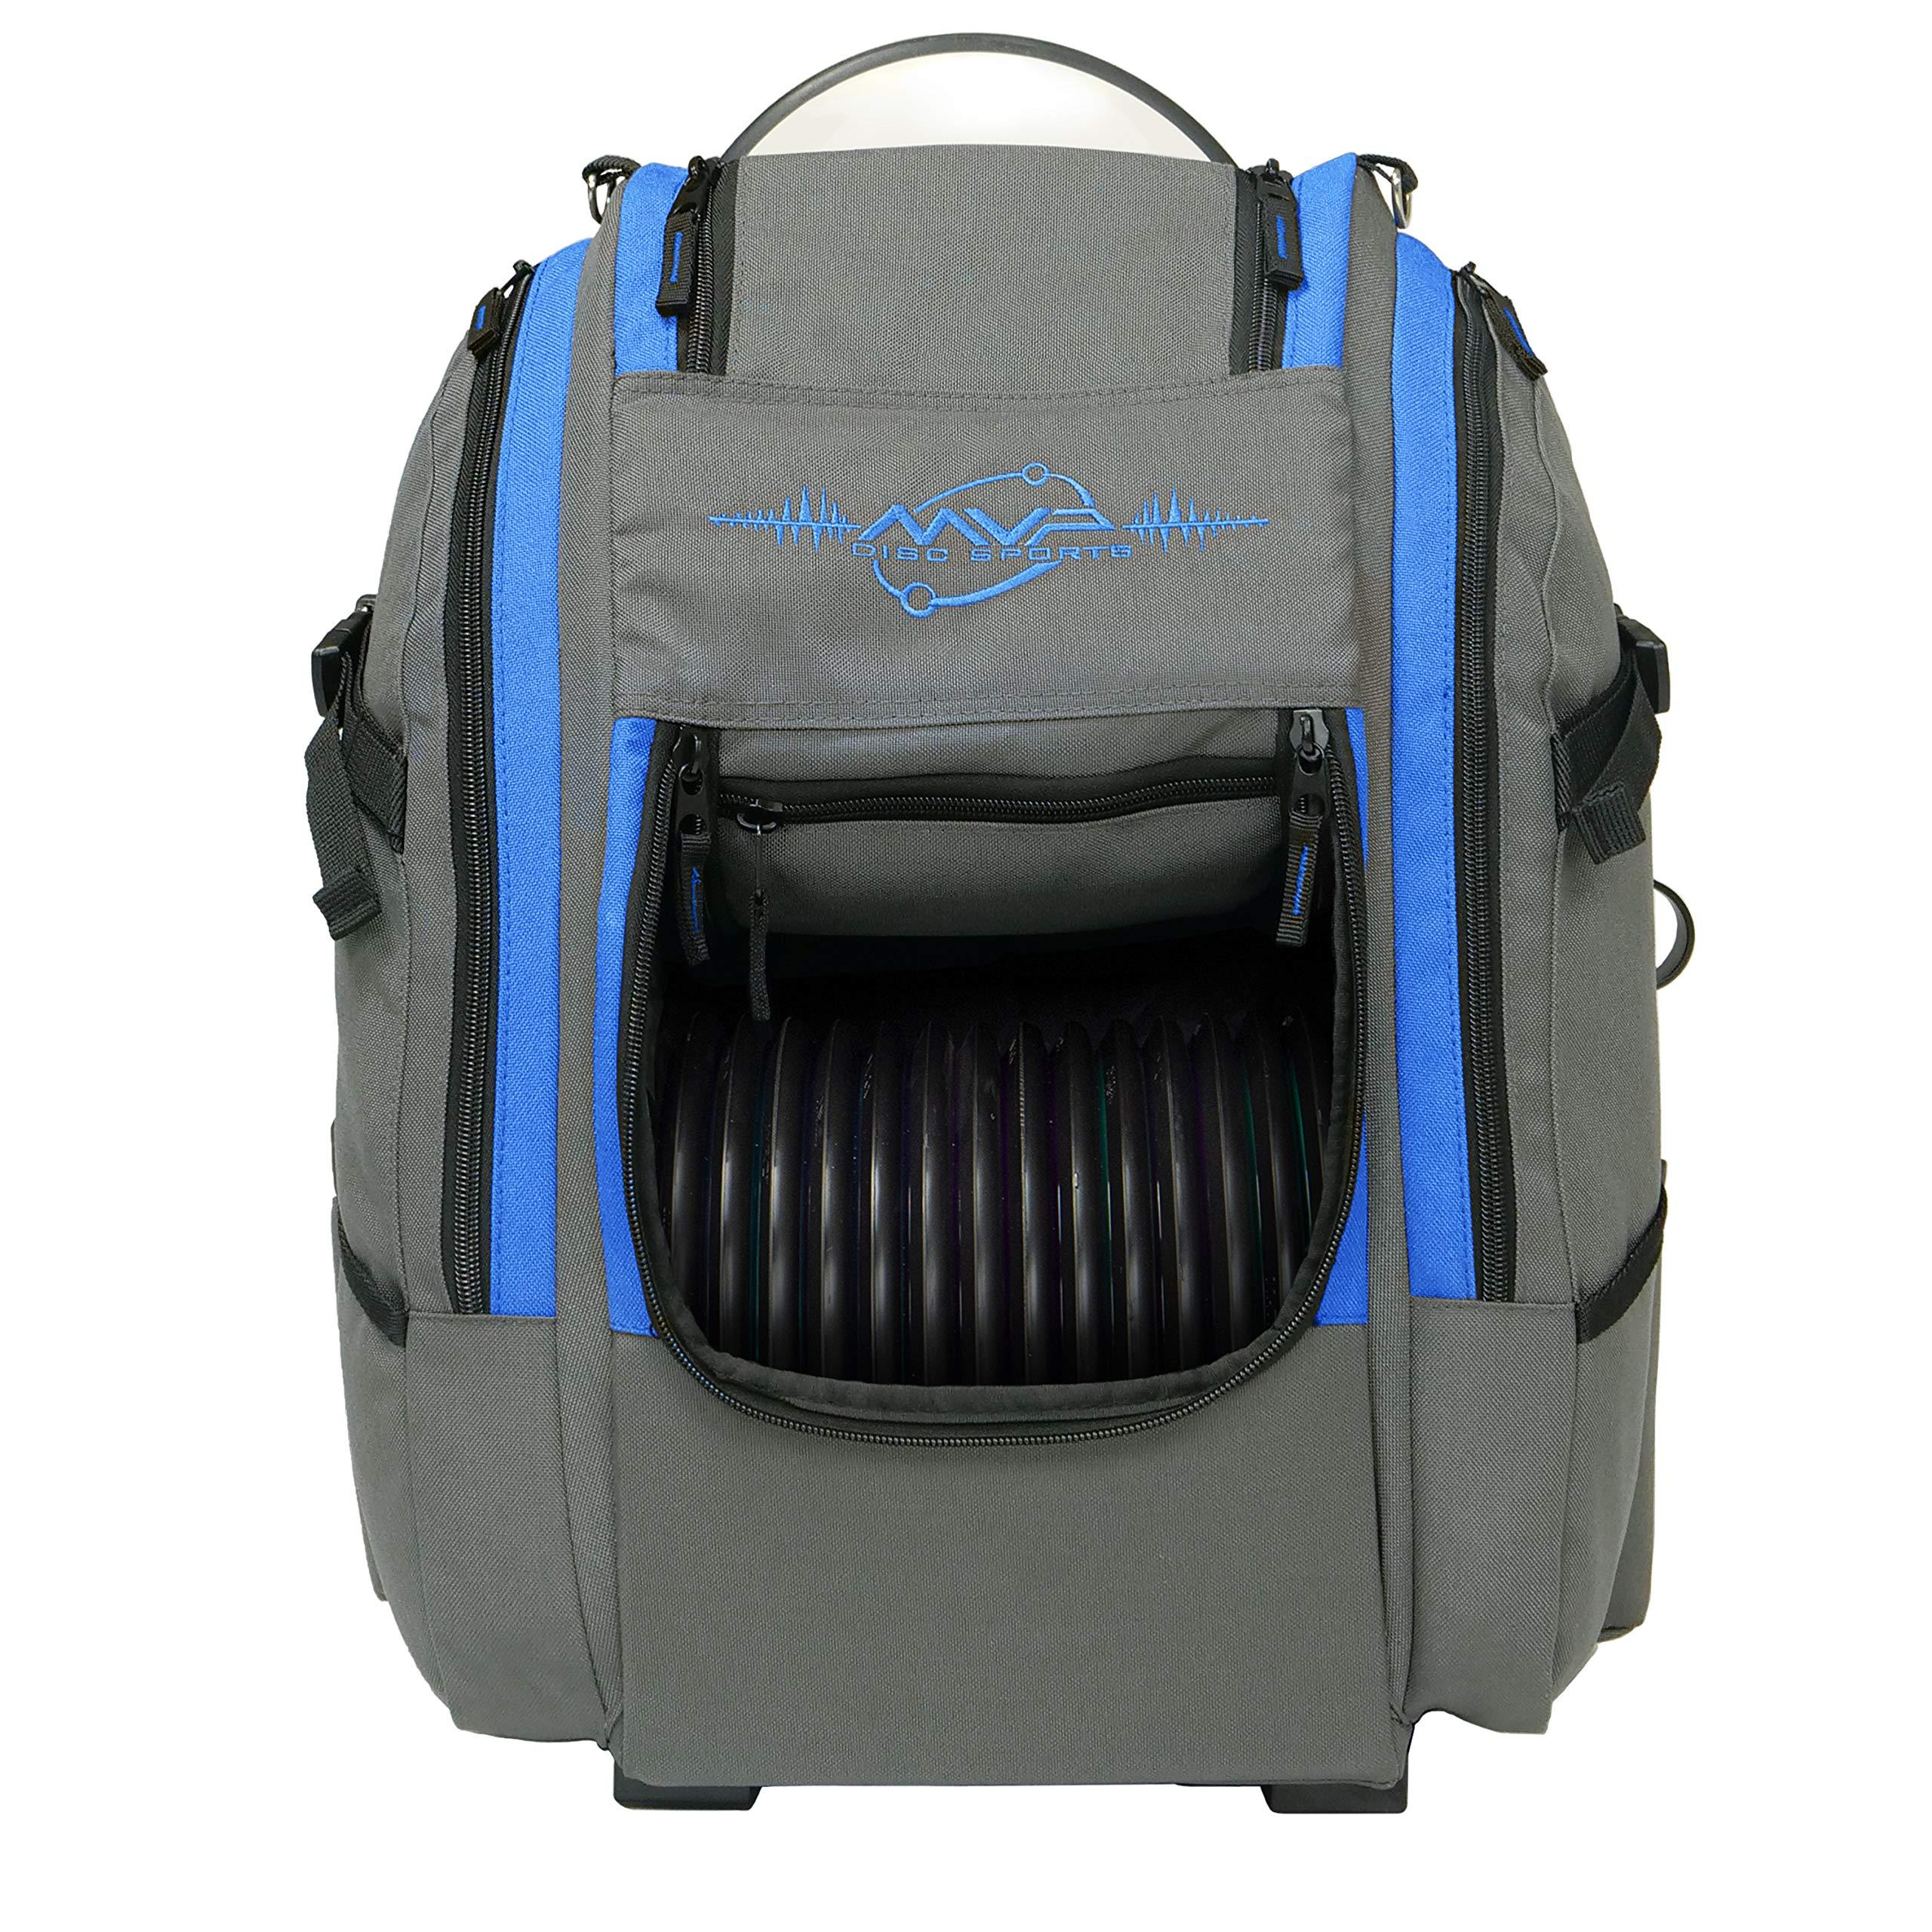 MVP Disc Sports Voyager Slim Bag (Gray/Royal) by MVP Disc Sports